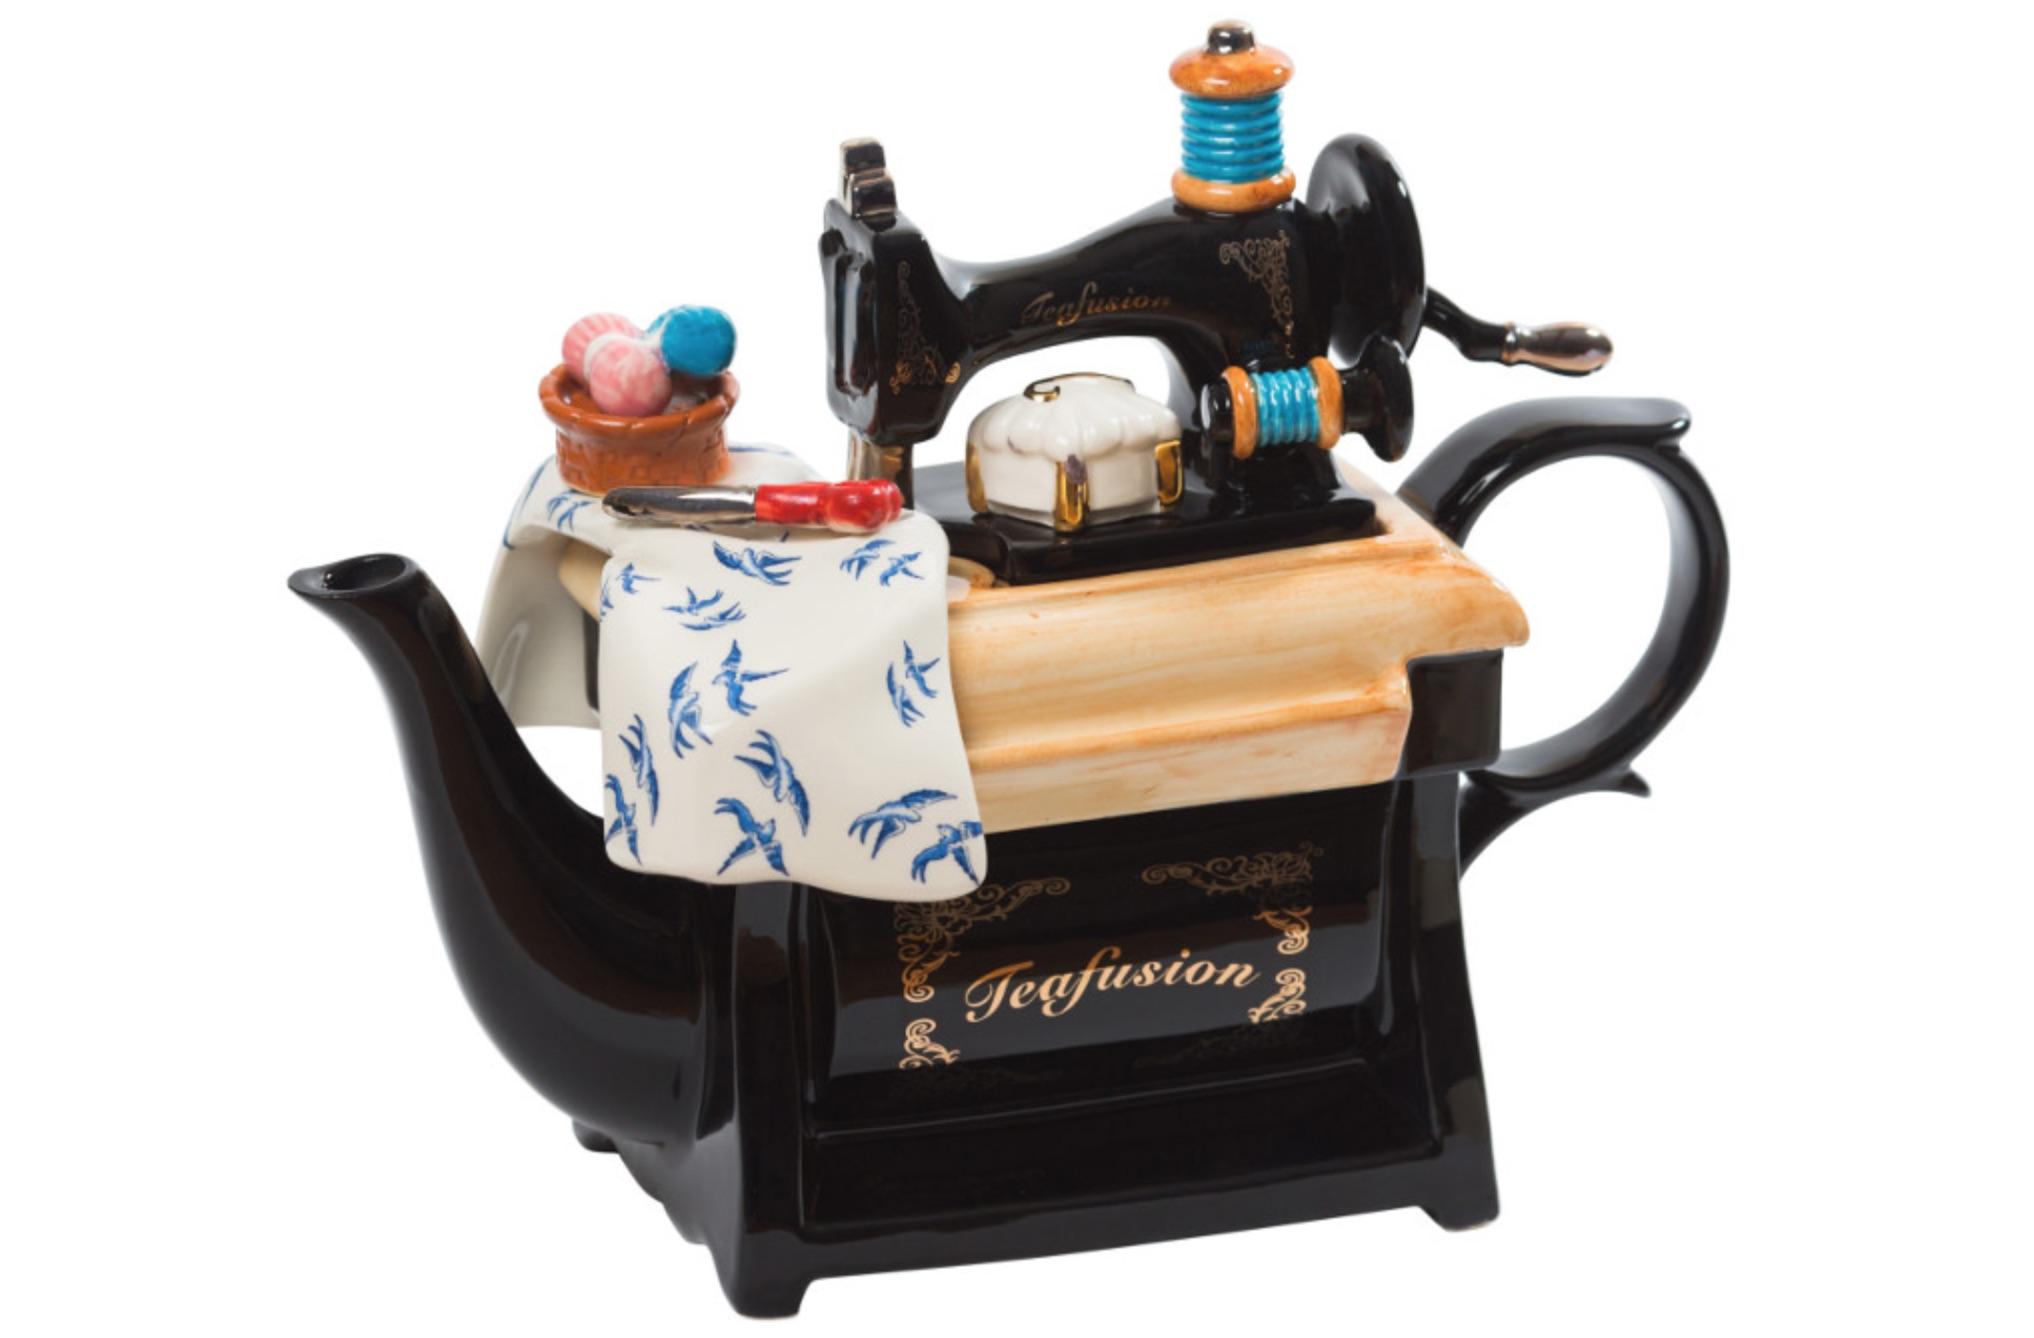 sewing machine novelty teapot